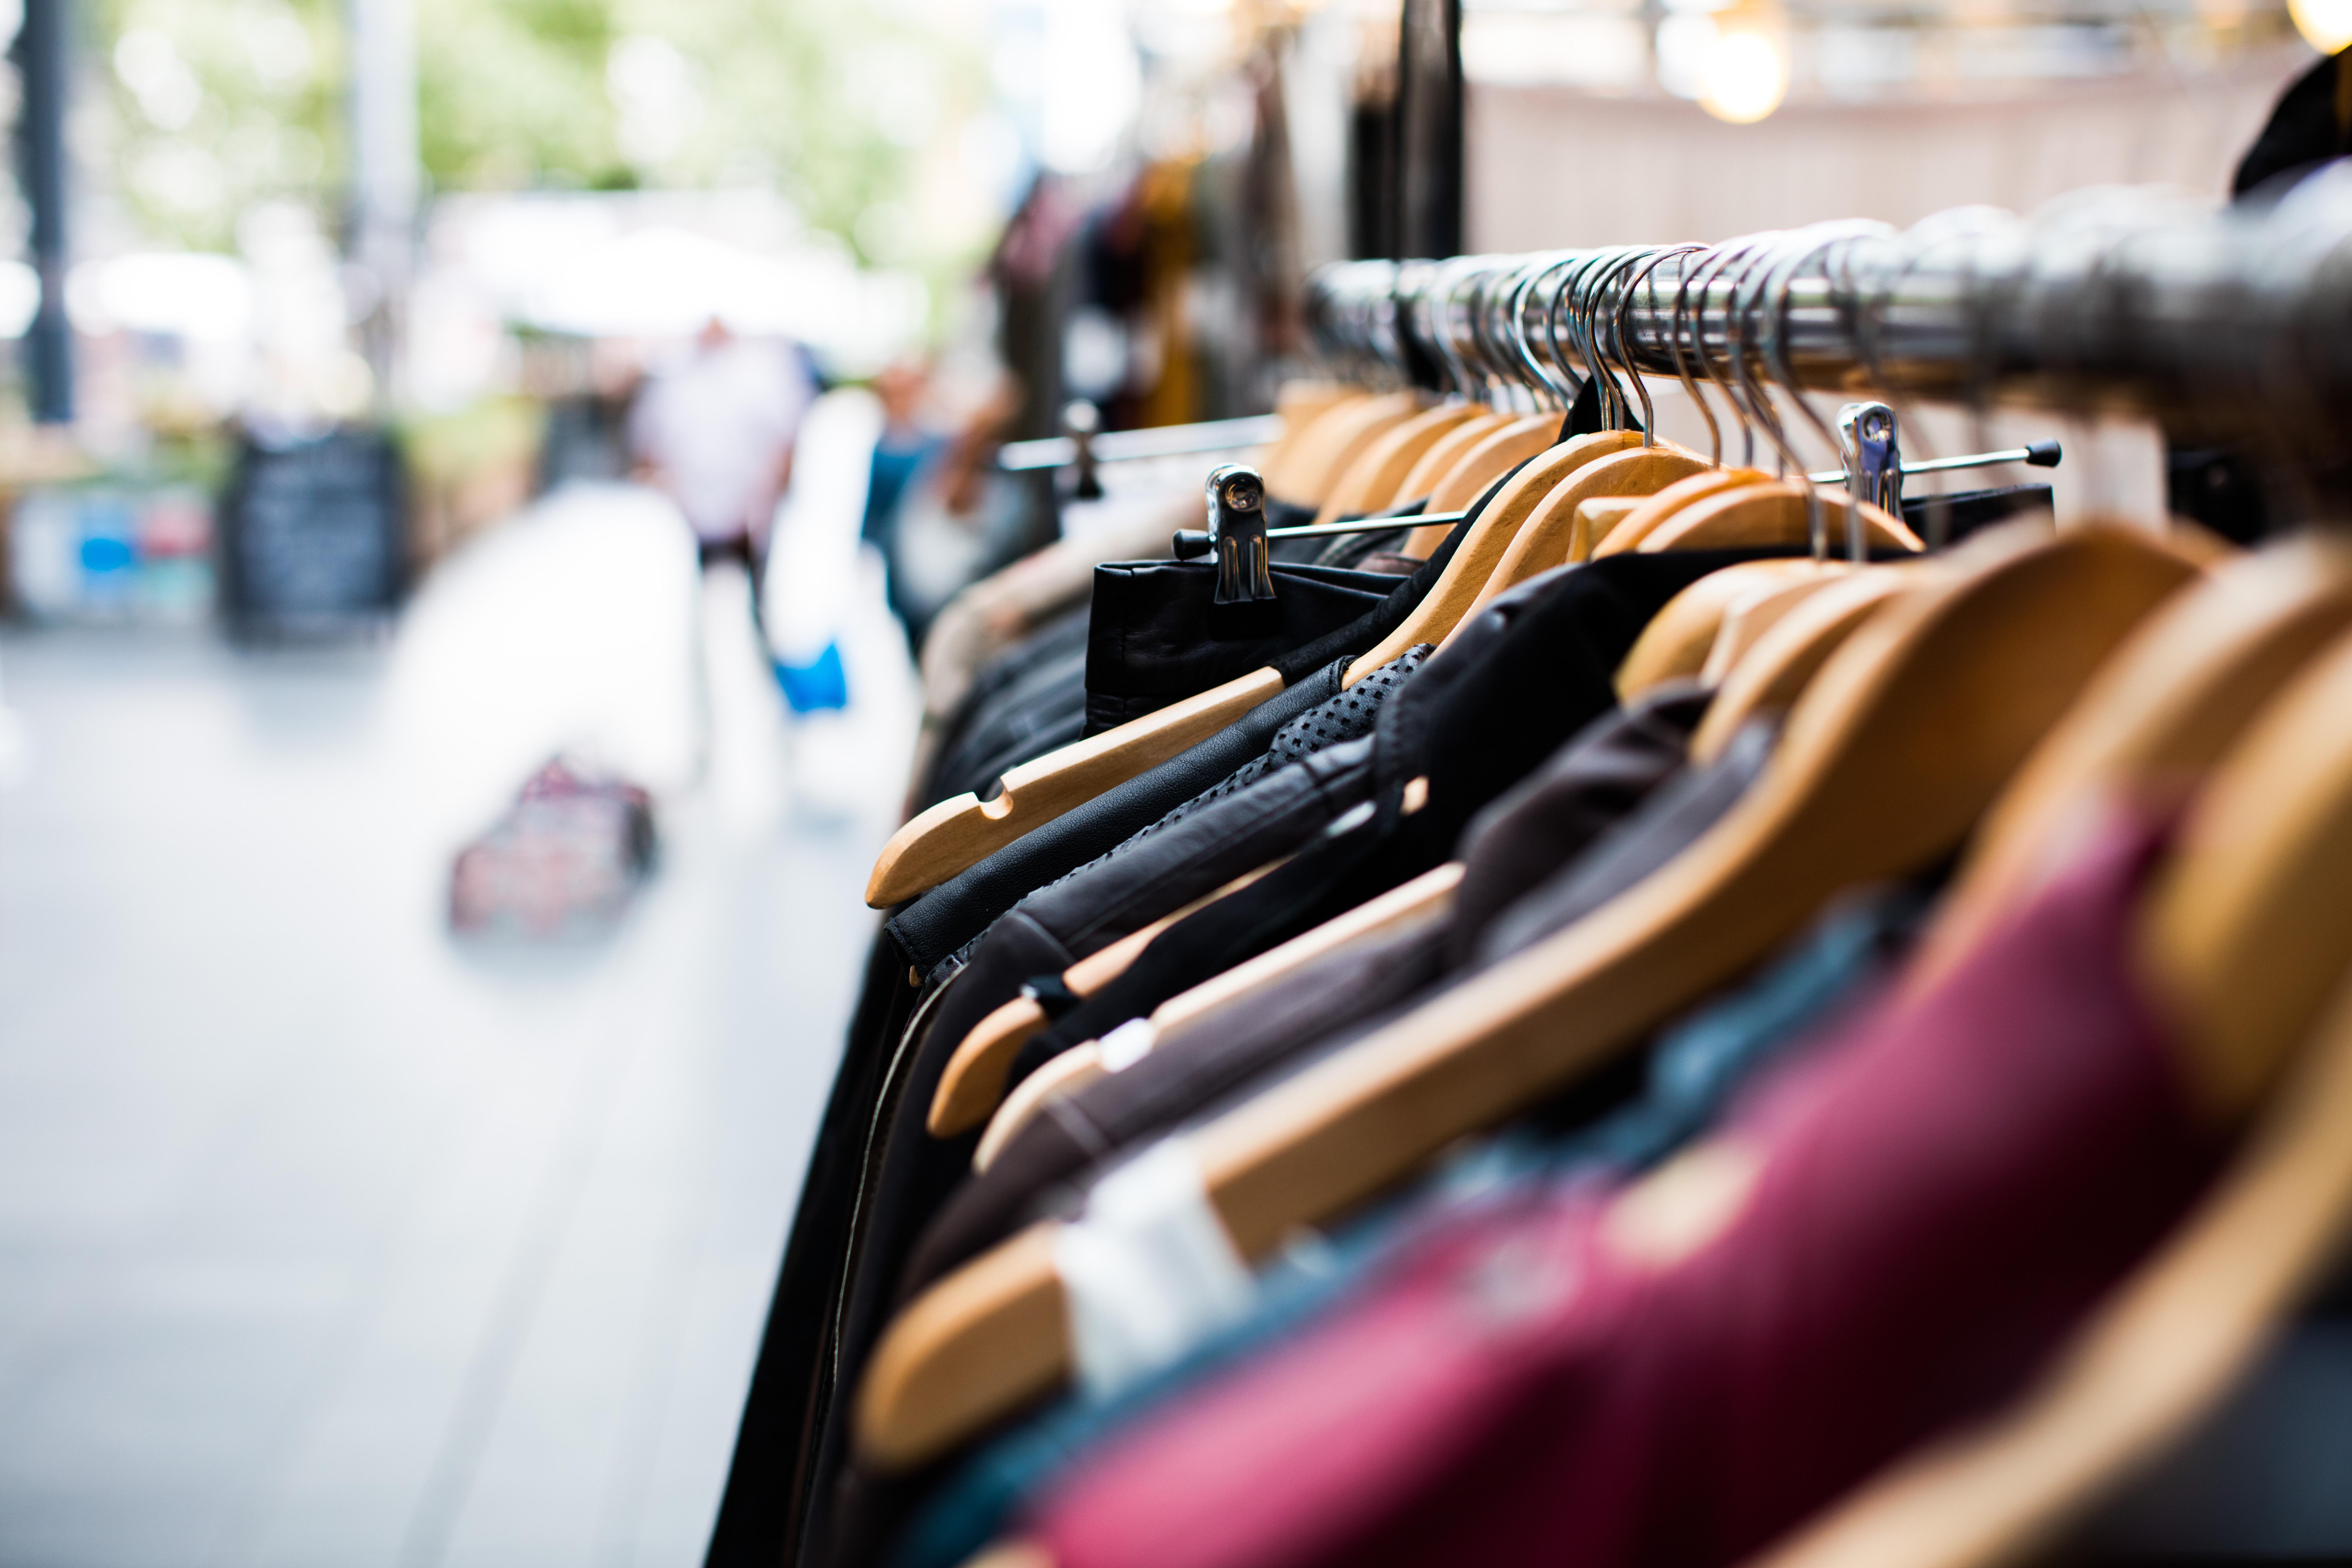 Die 3 besten Secondhand-Läden in Berlin